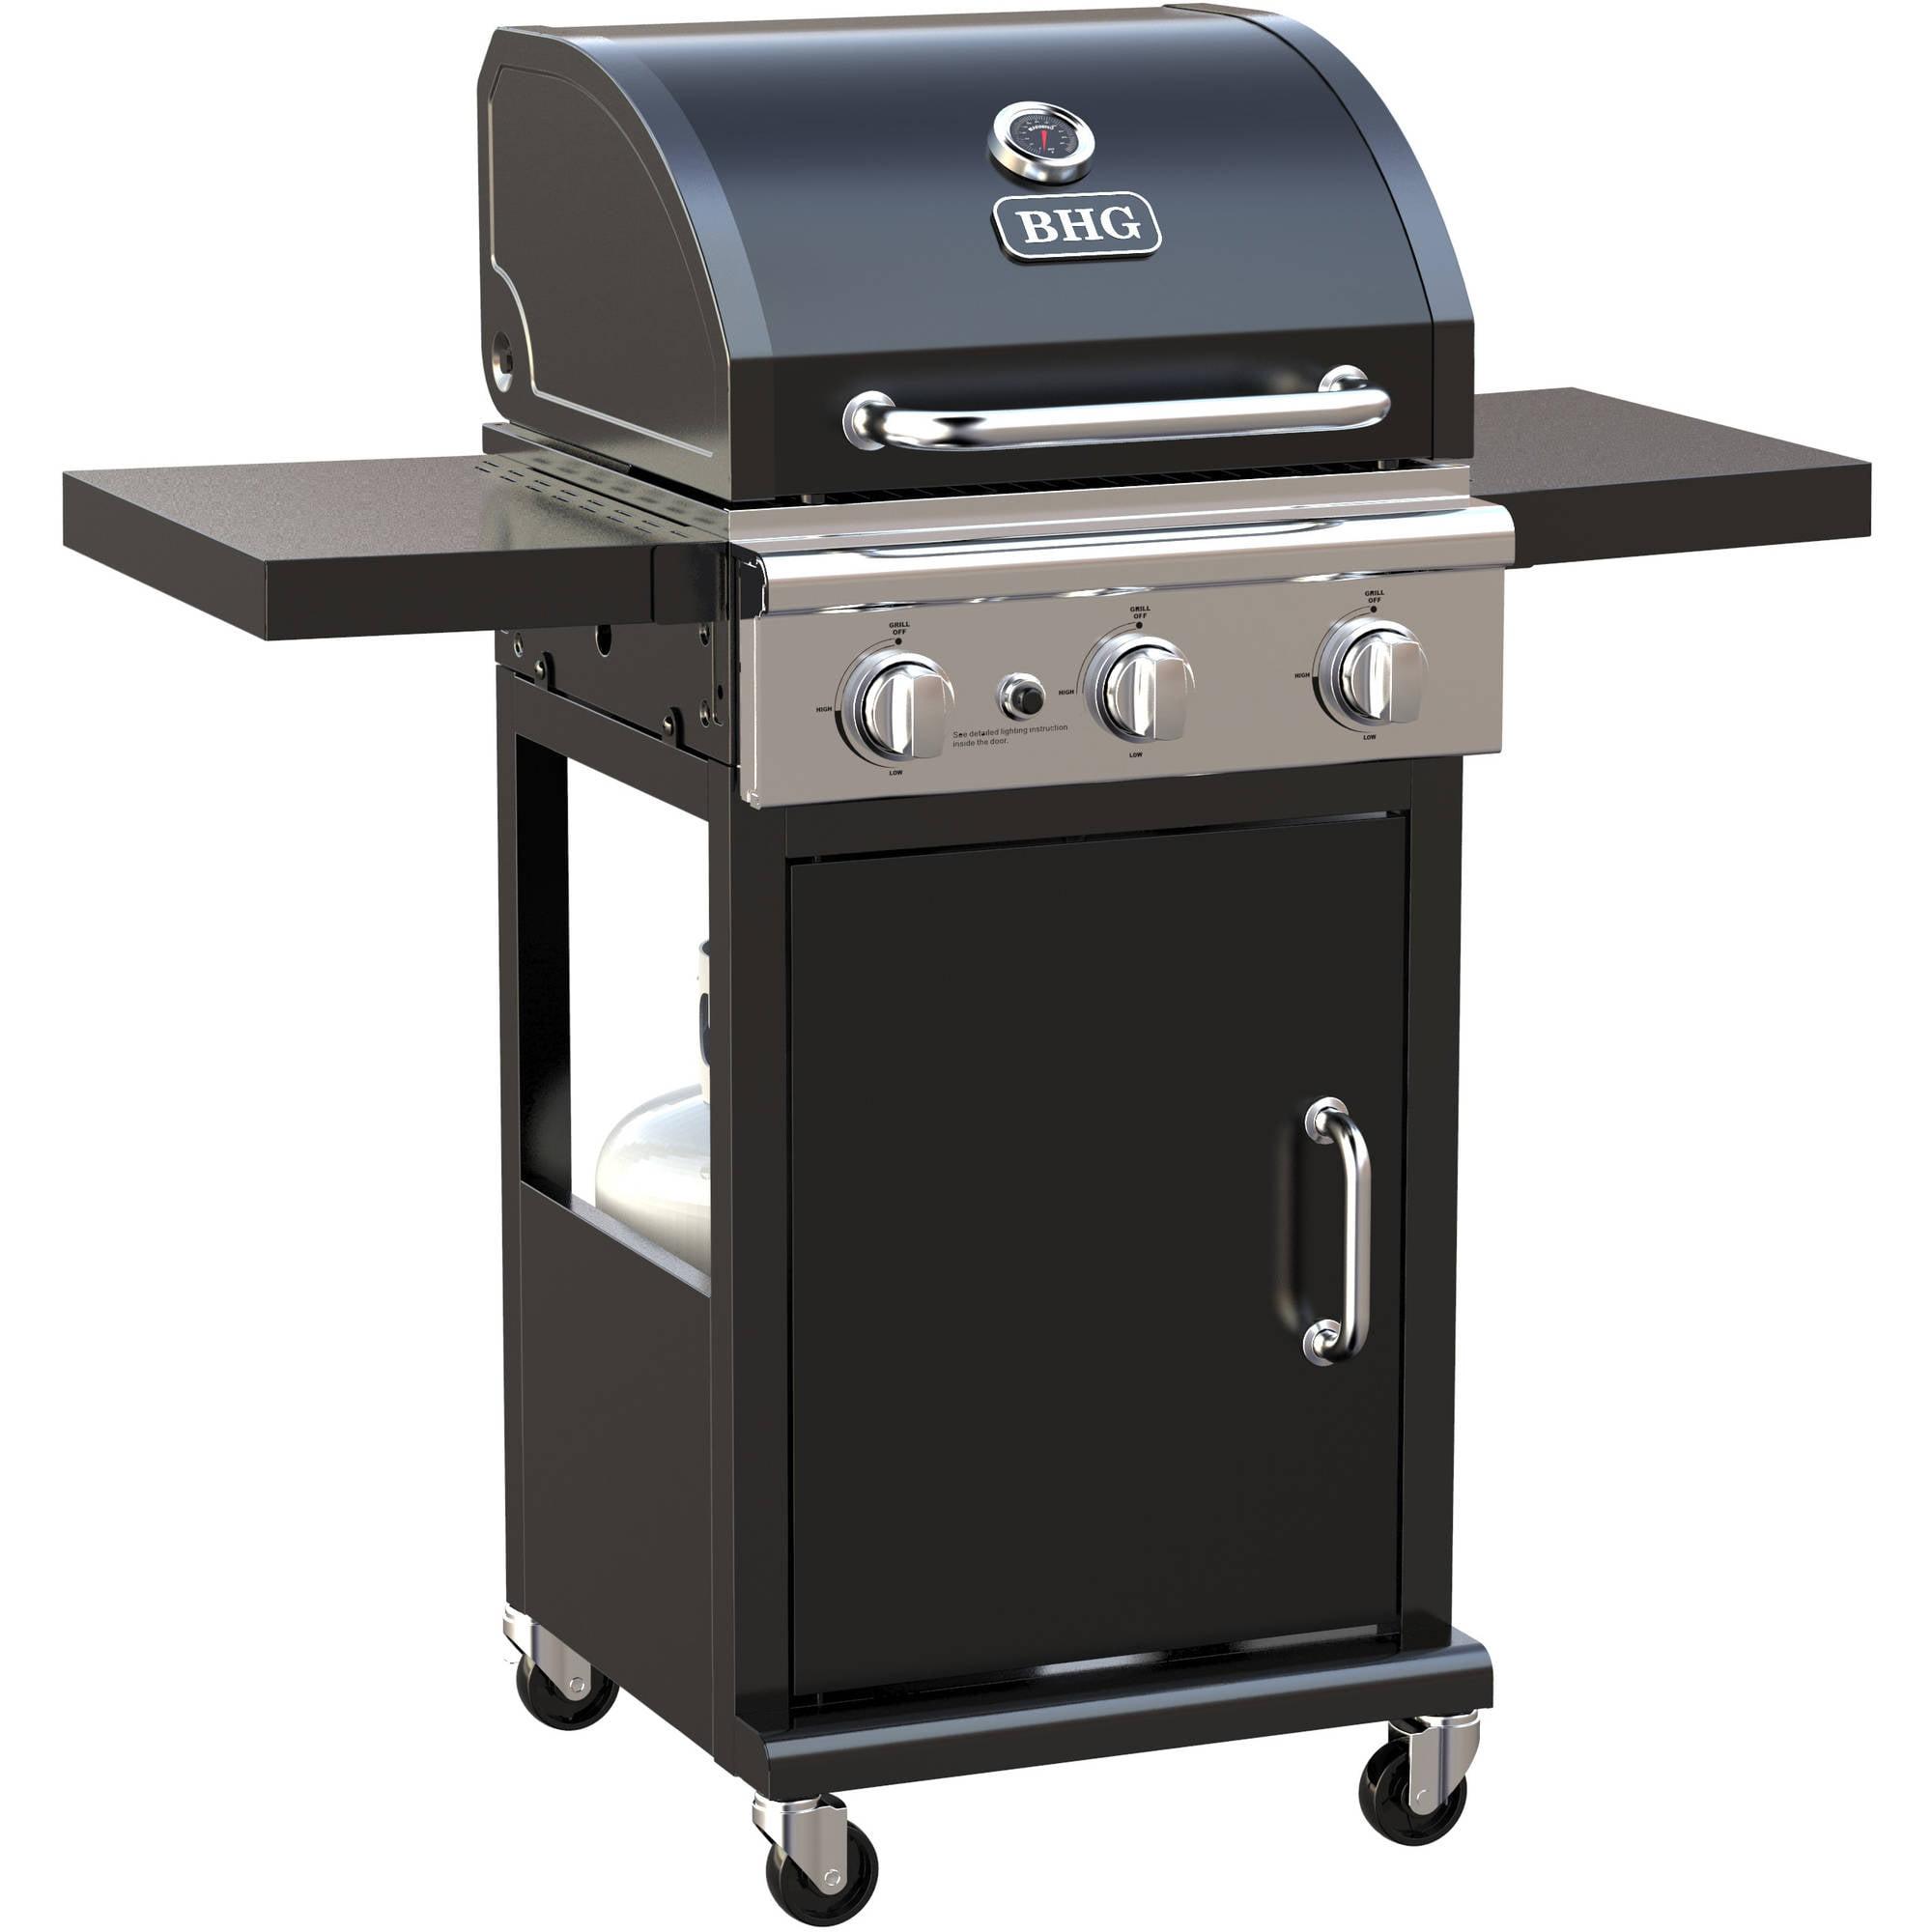 barbecue machine walmart